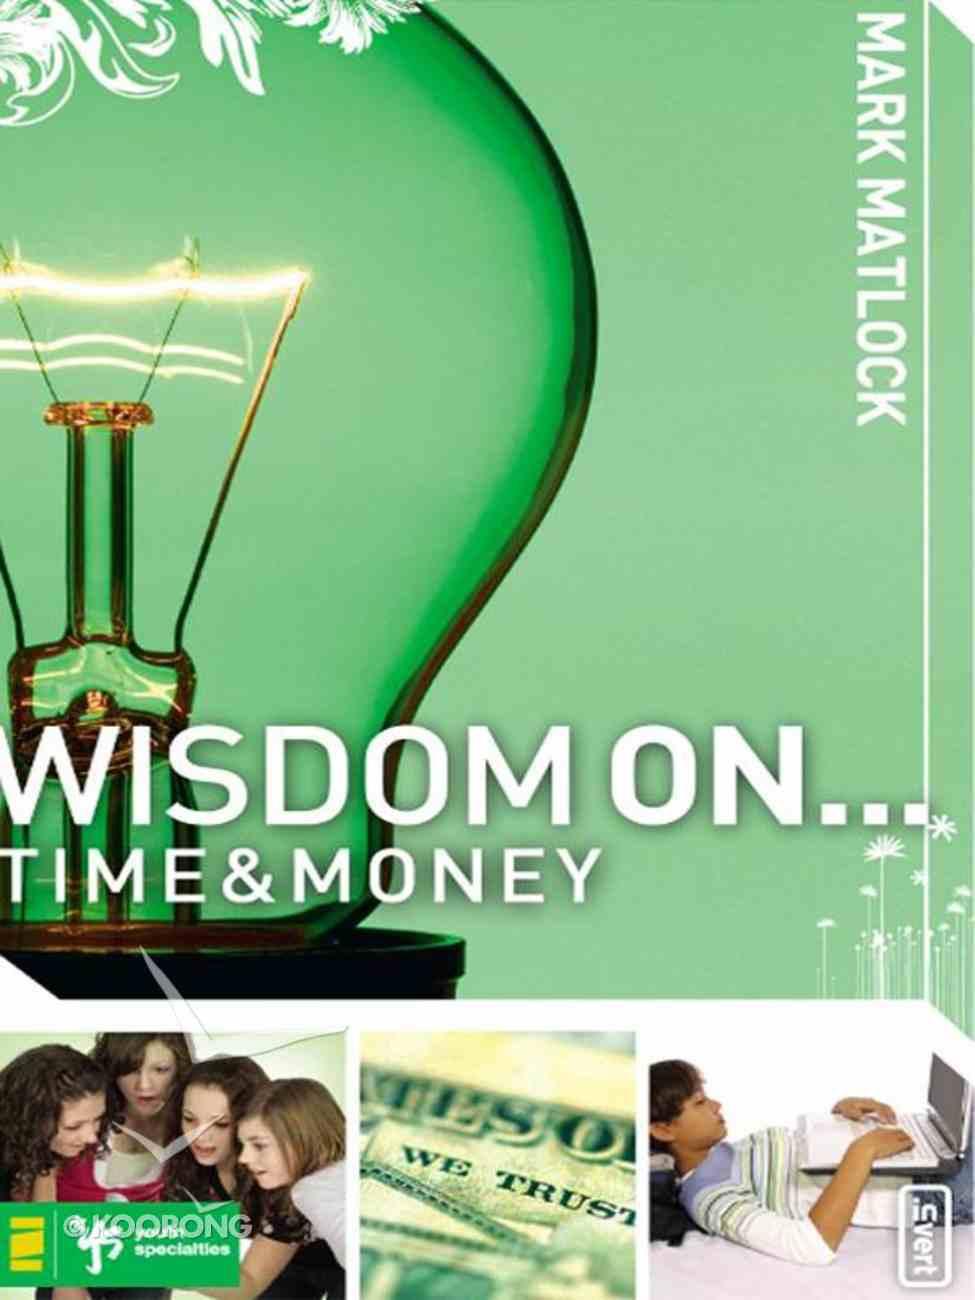 Wisdom on ... Time & Money (Wisdom On Series) eBook